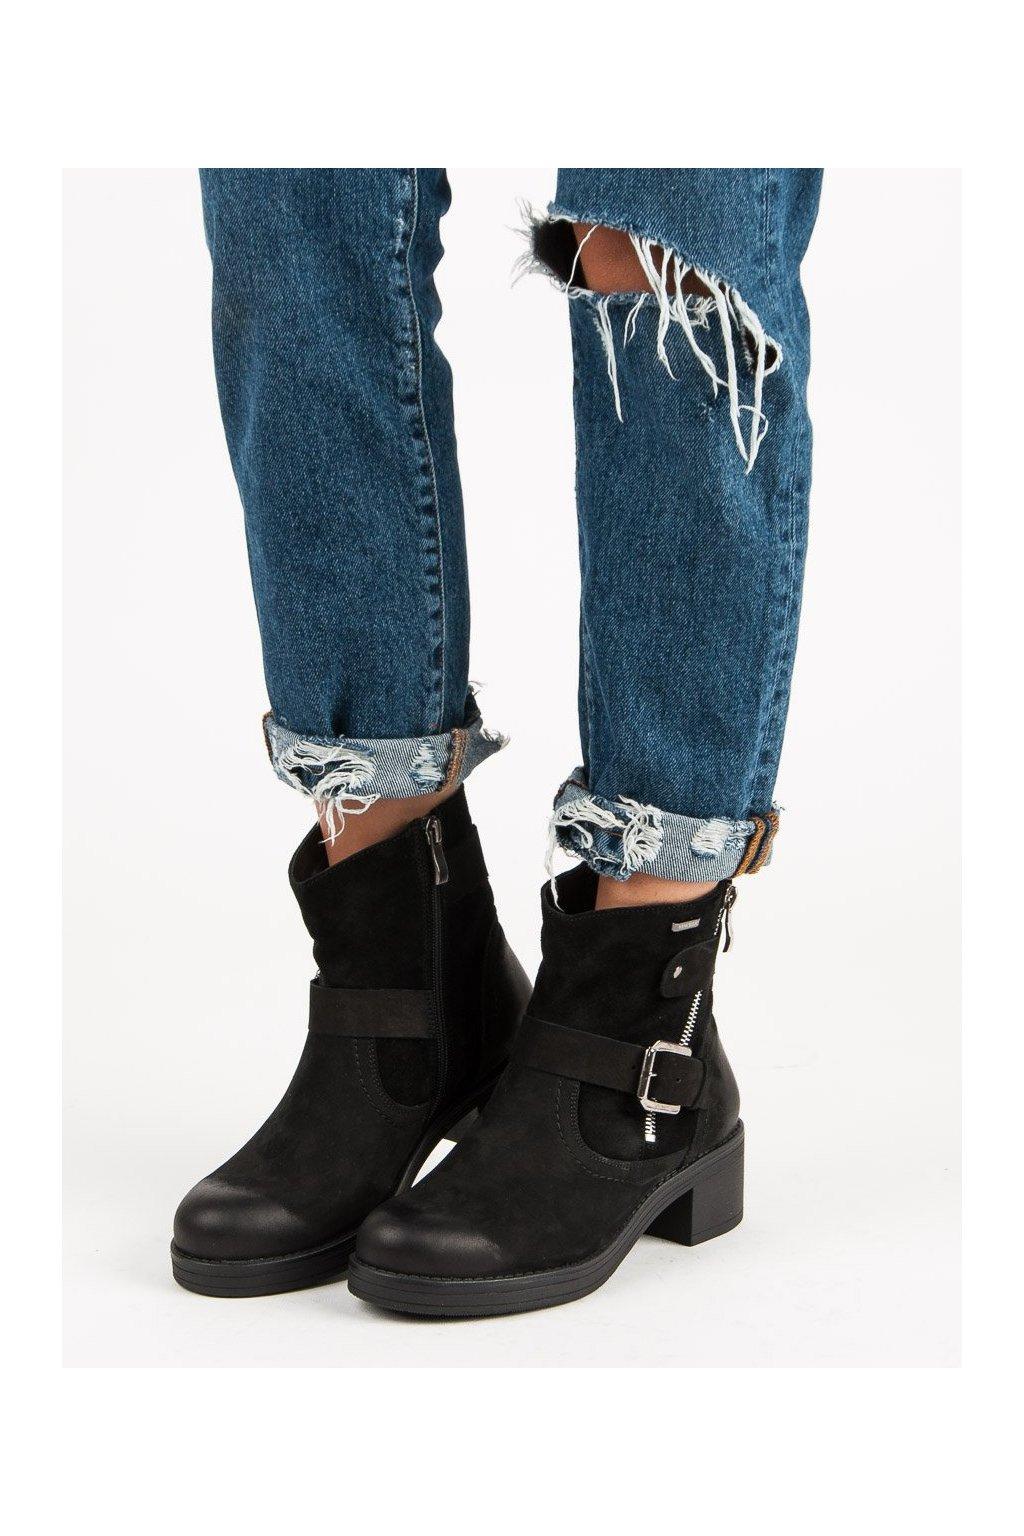 dámske topánky Vinceza kod WZ1267/5B